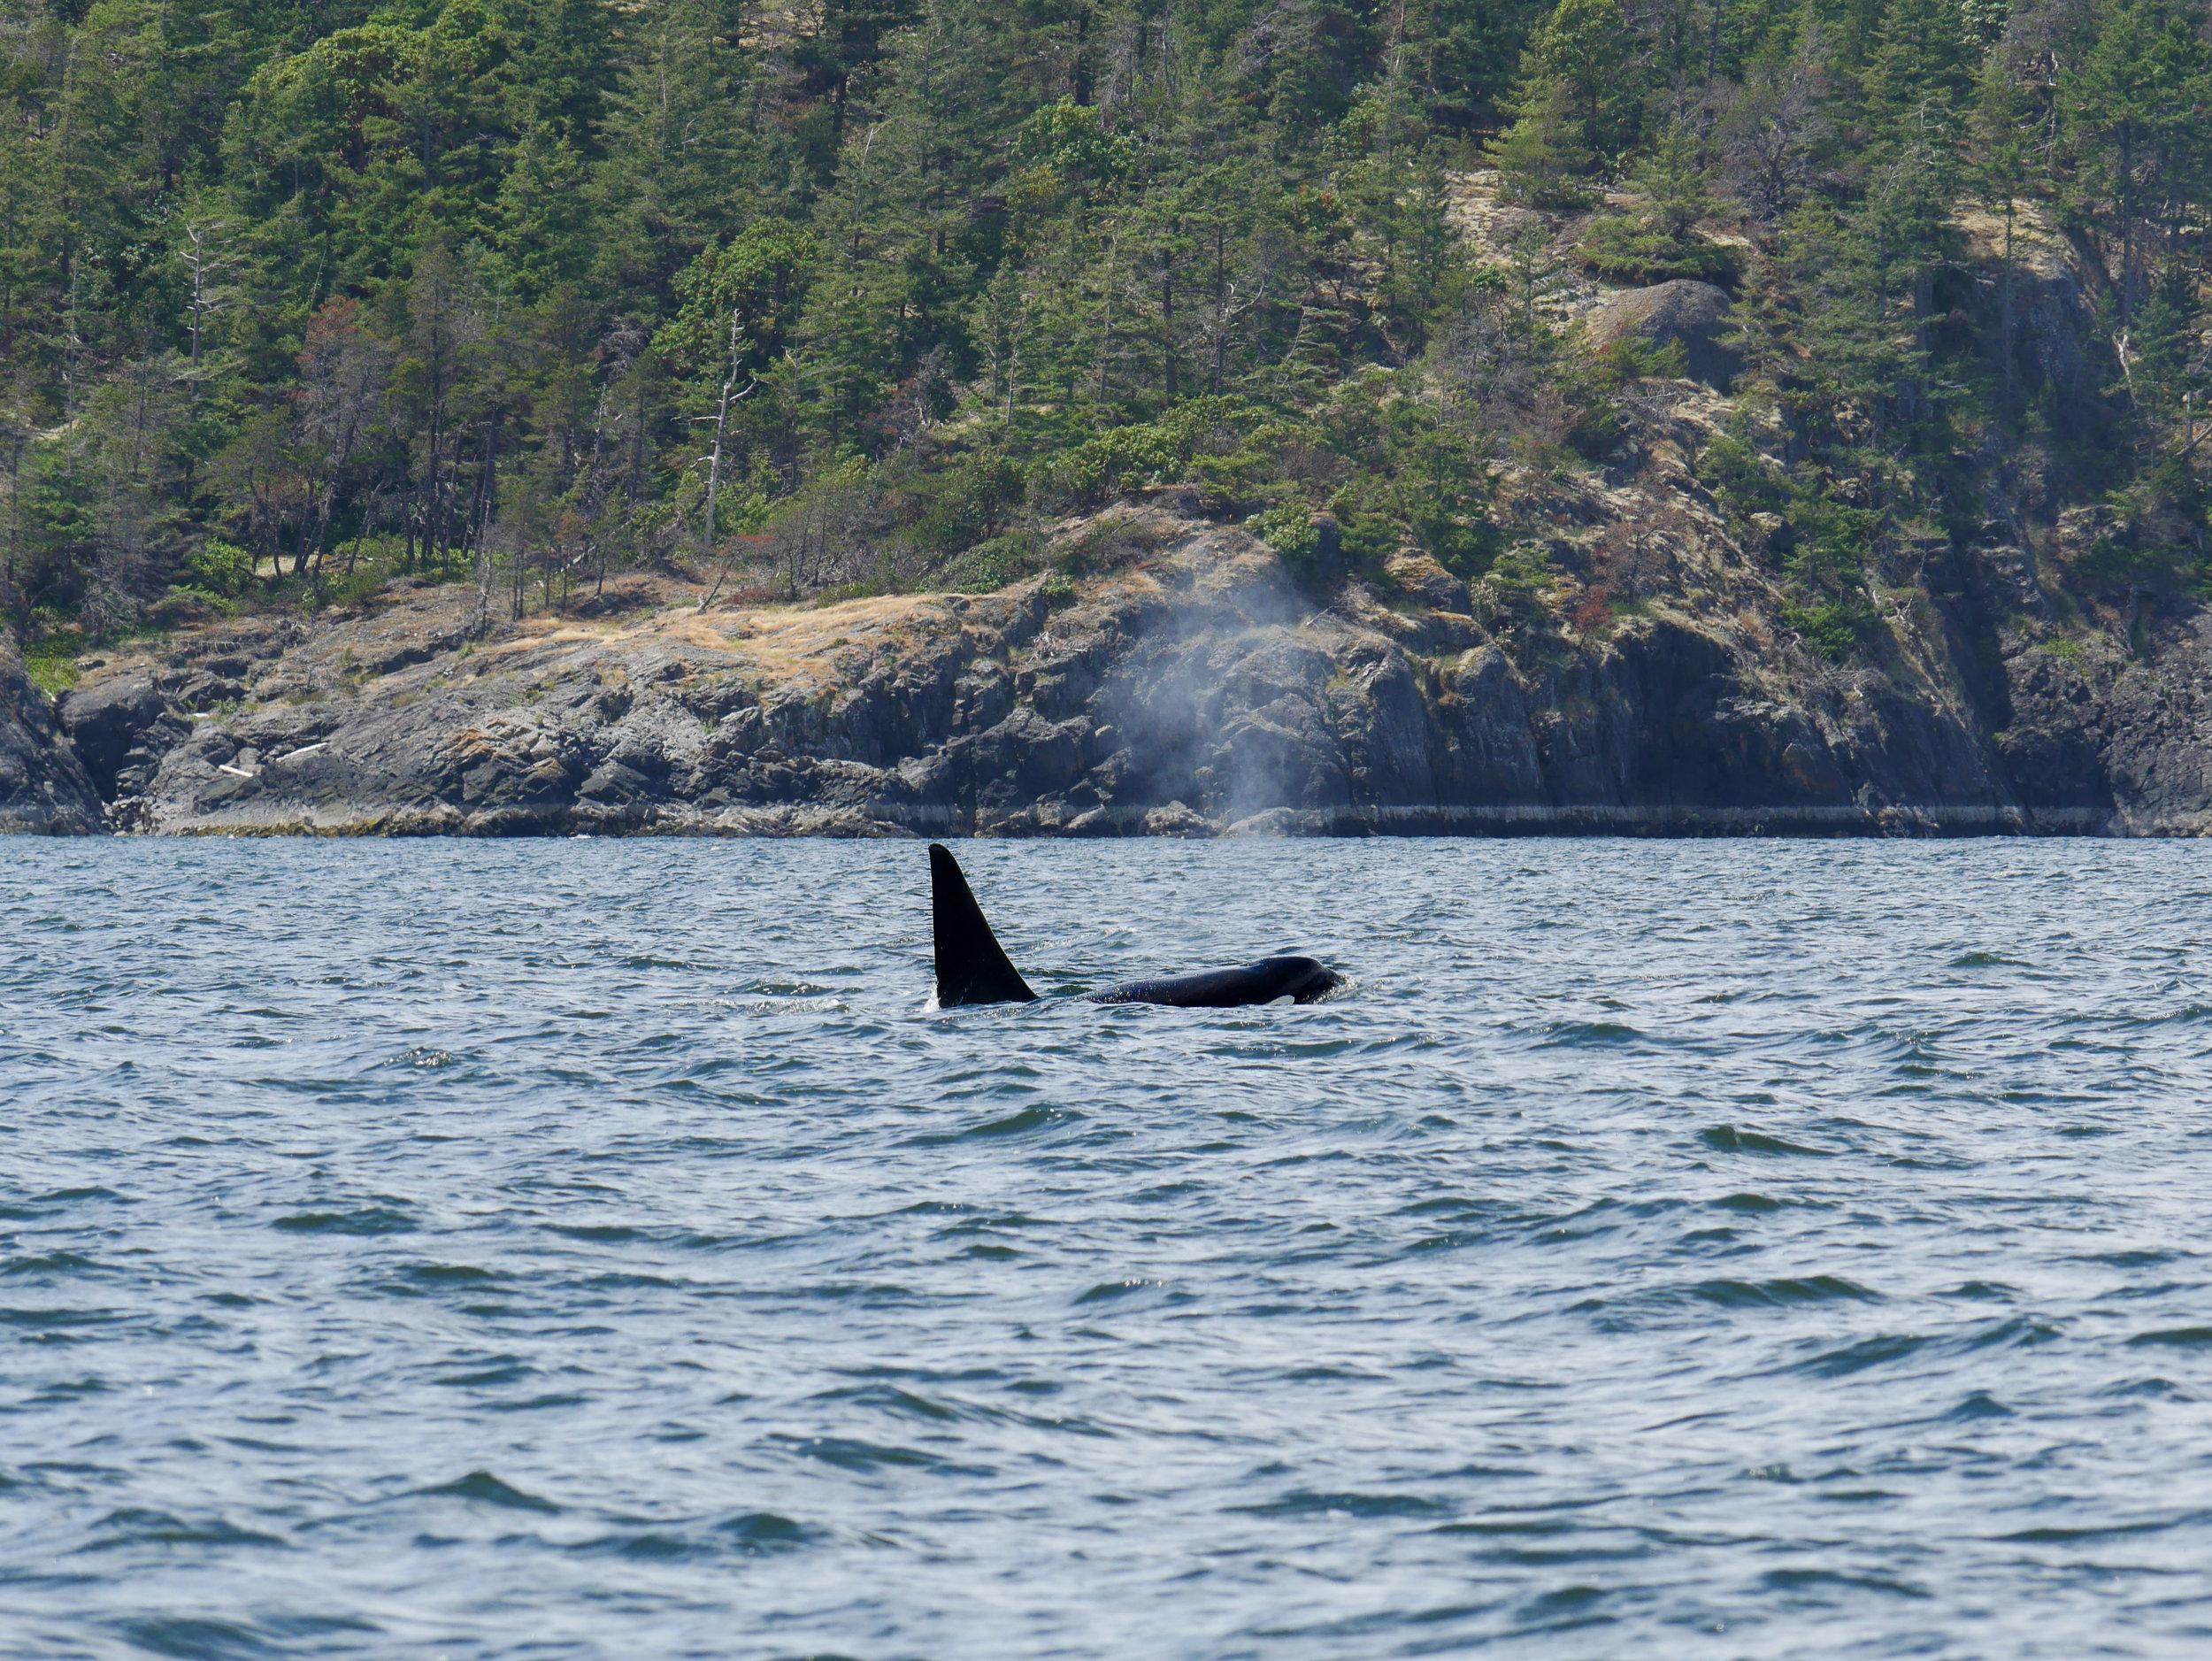 Transient Killer Whale. Photo taken by Val Watson.